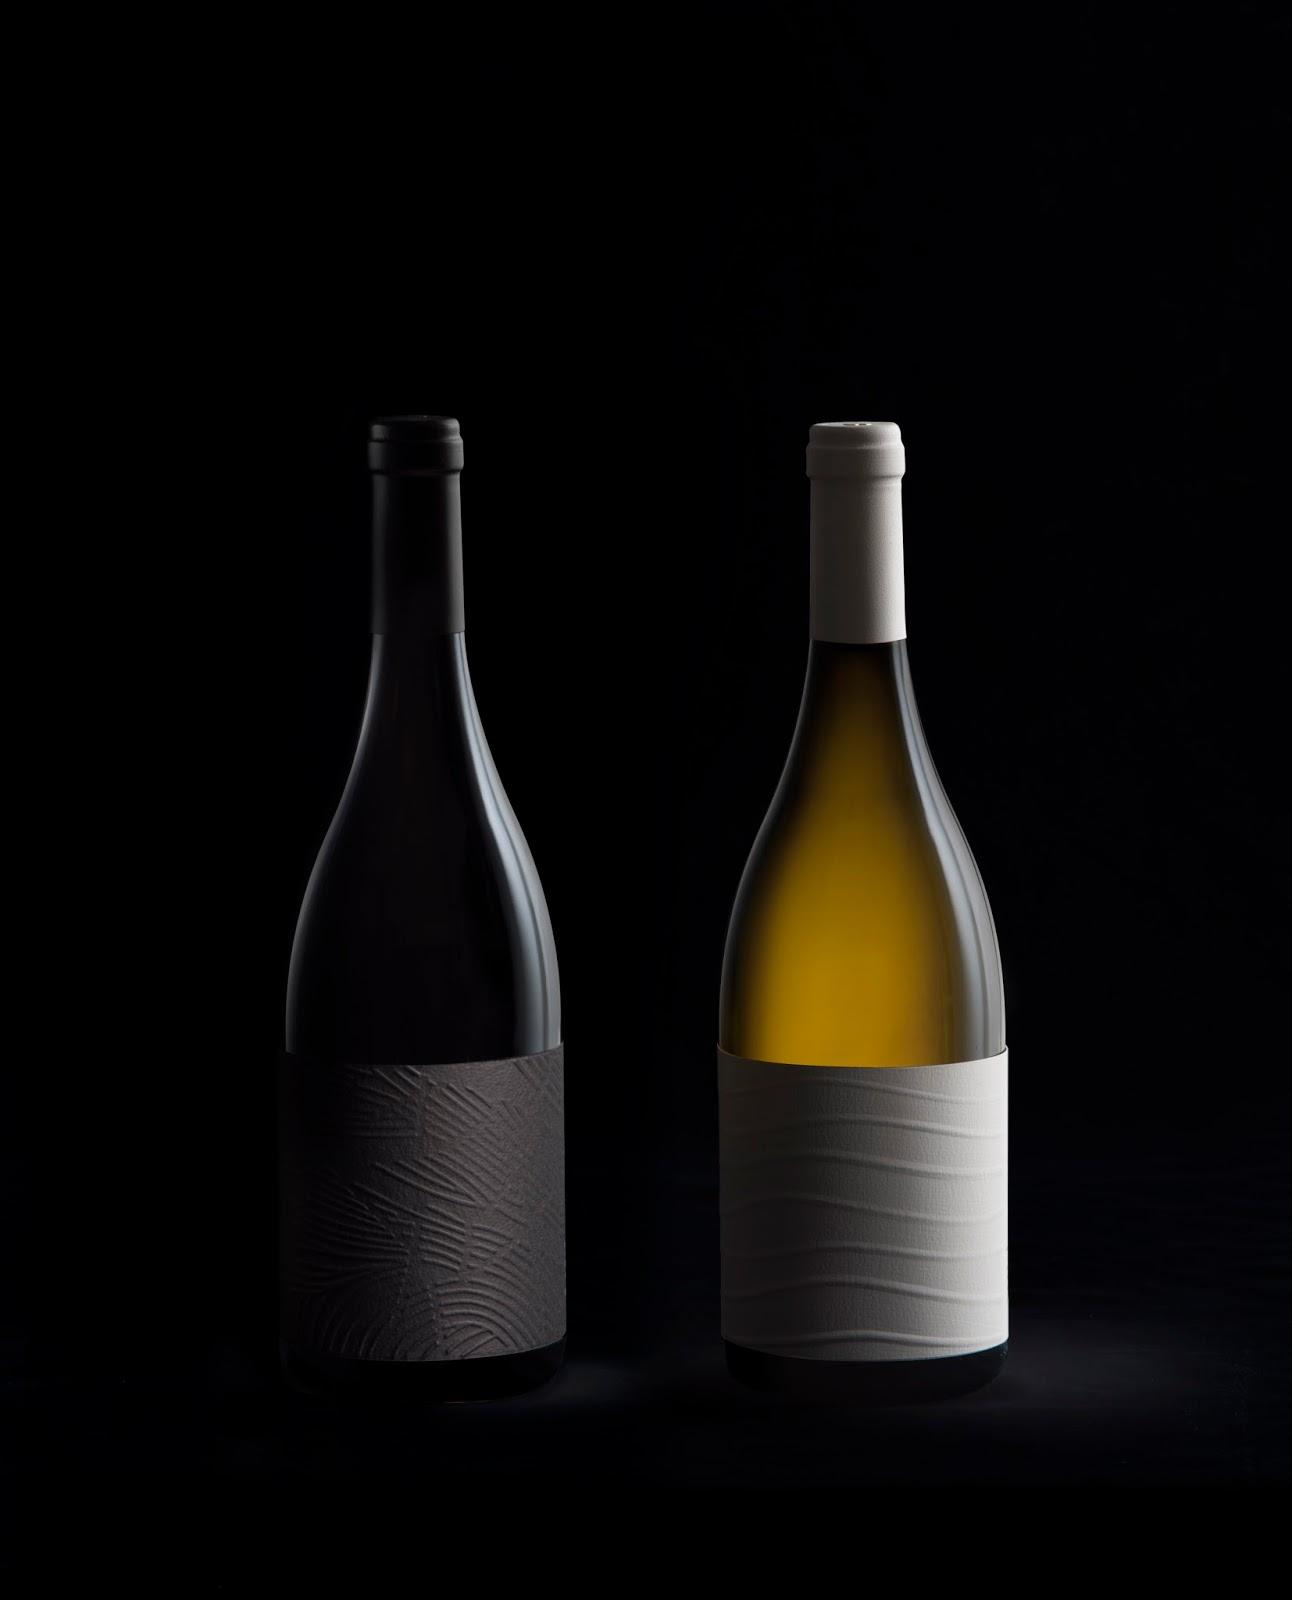 SAVI / AQUI Wine Label Designed By Pablo Calzado, Mario Montull, María López